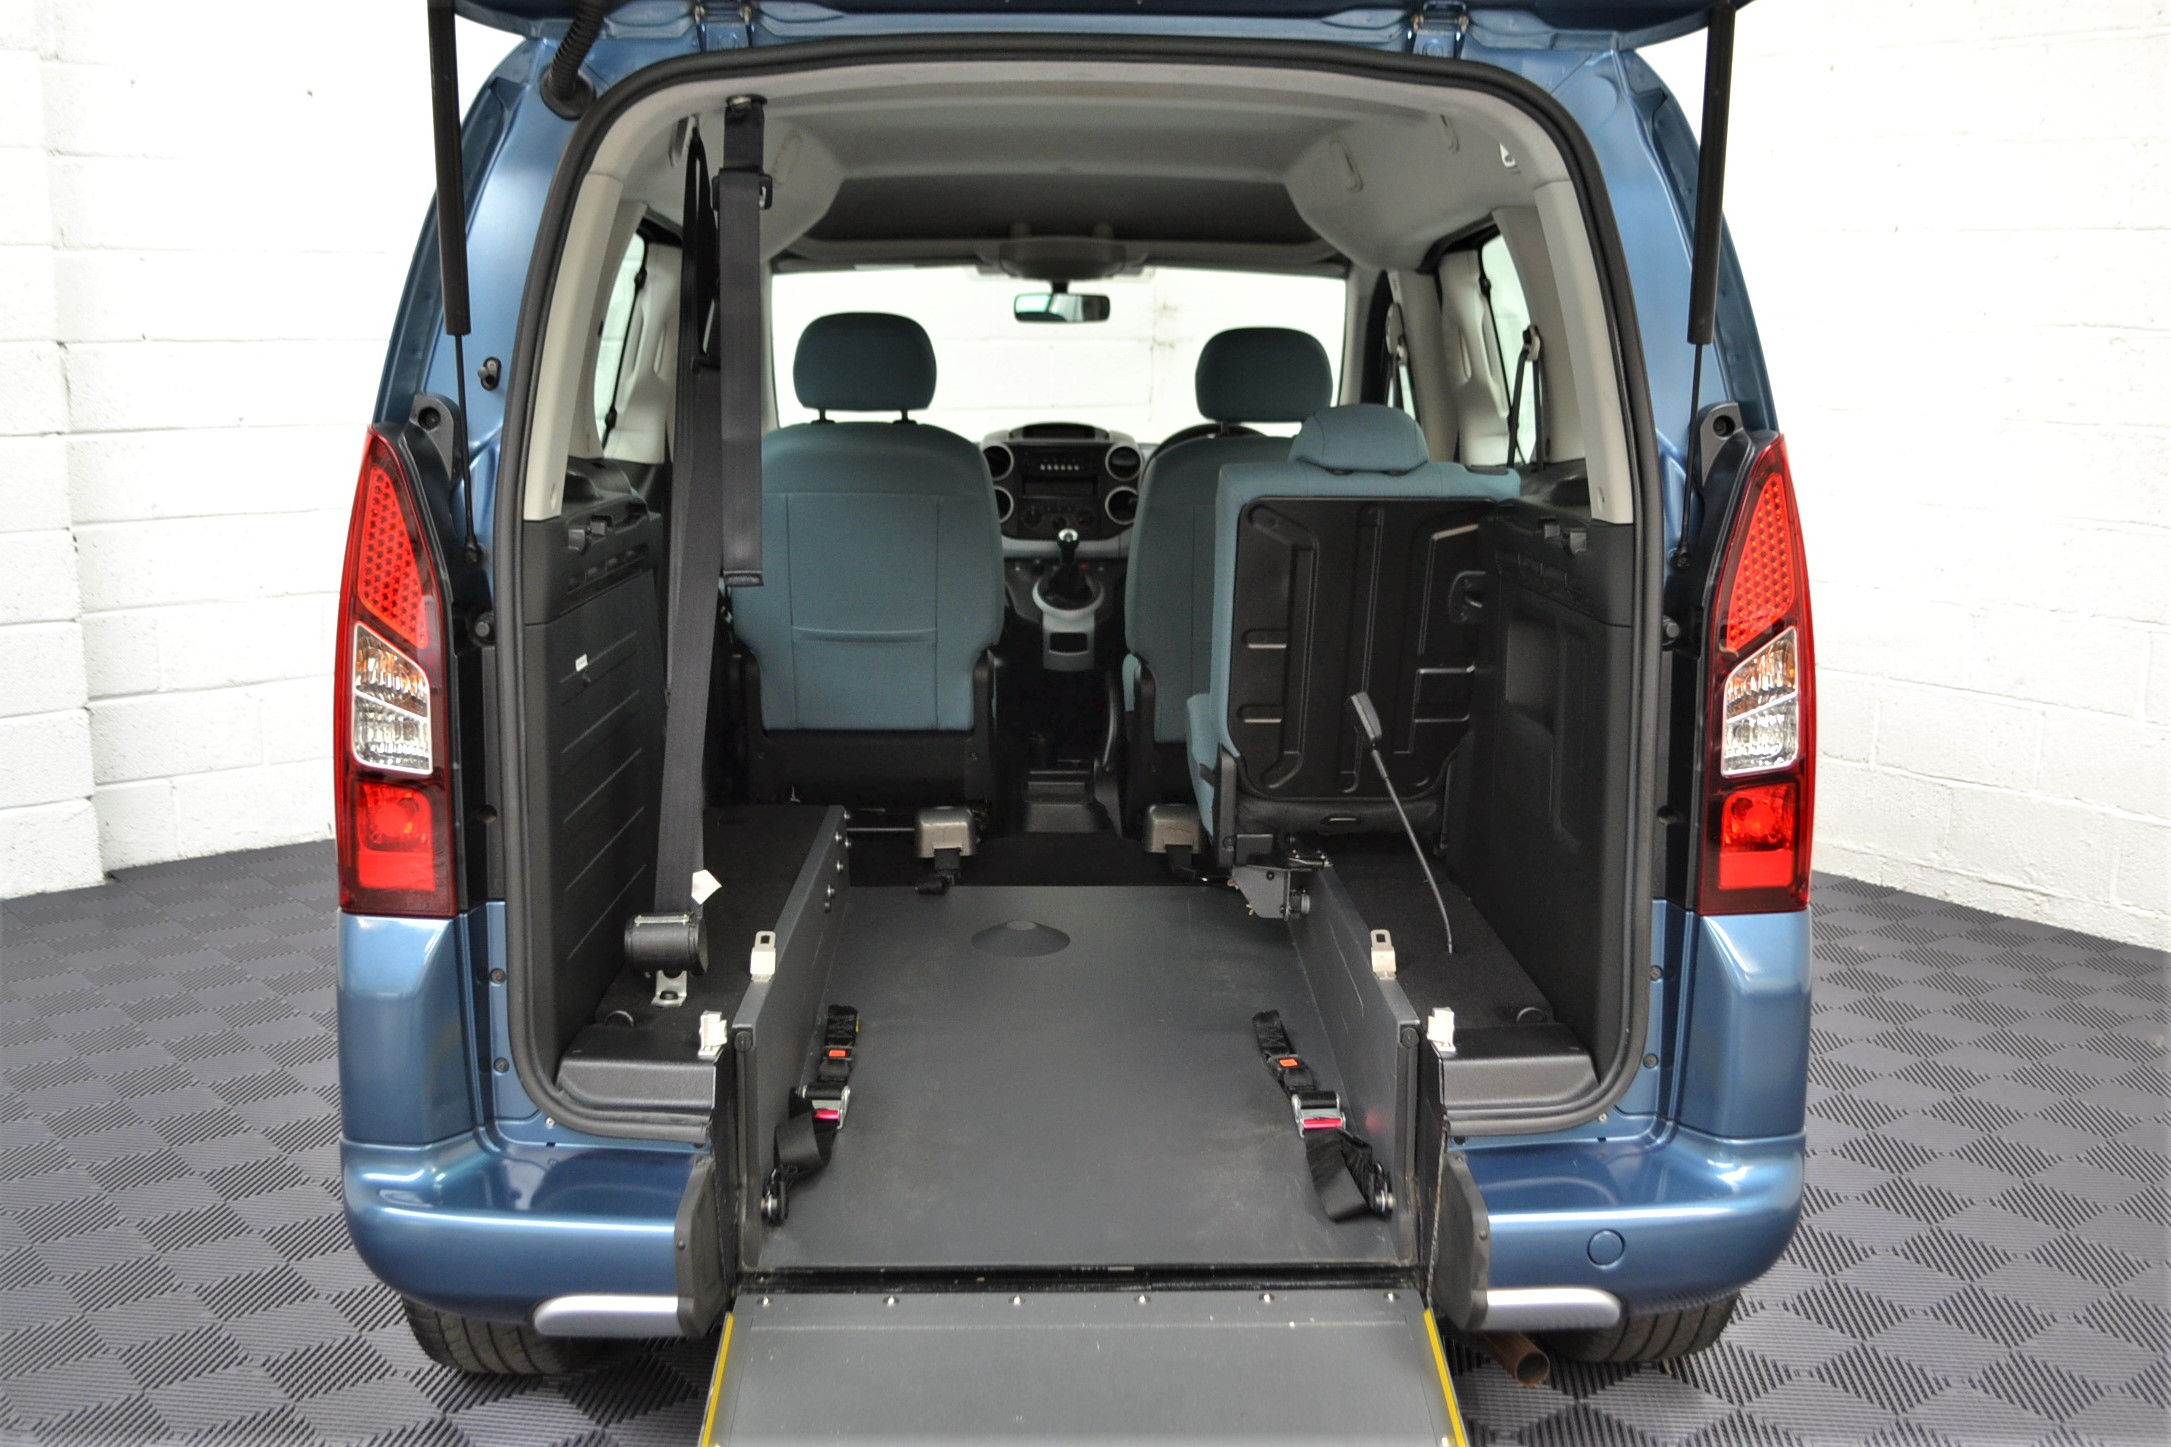 WAV Cars For Sale Bristol Wheelchair Accessible Vehicles Used For Sale Somerset Devon Dorset Bath Citroen Berlingo WA14 JYS 8